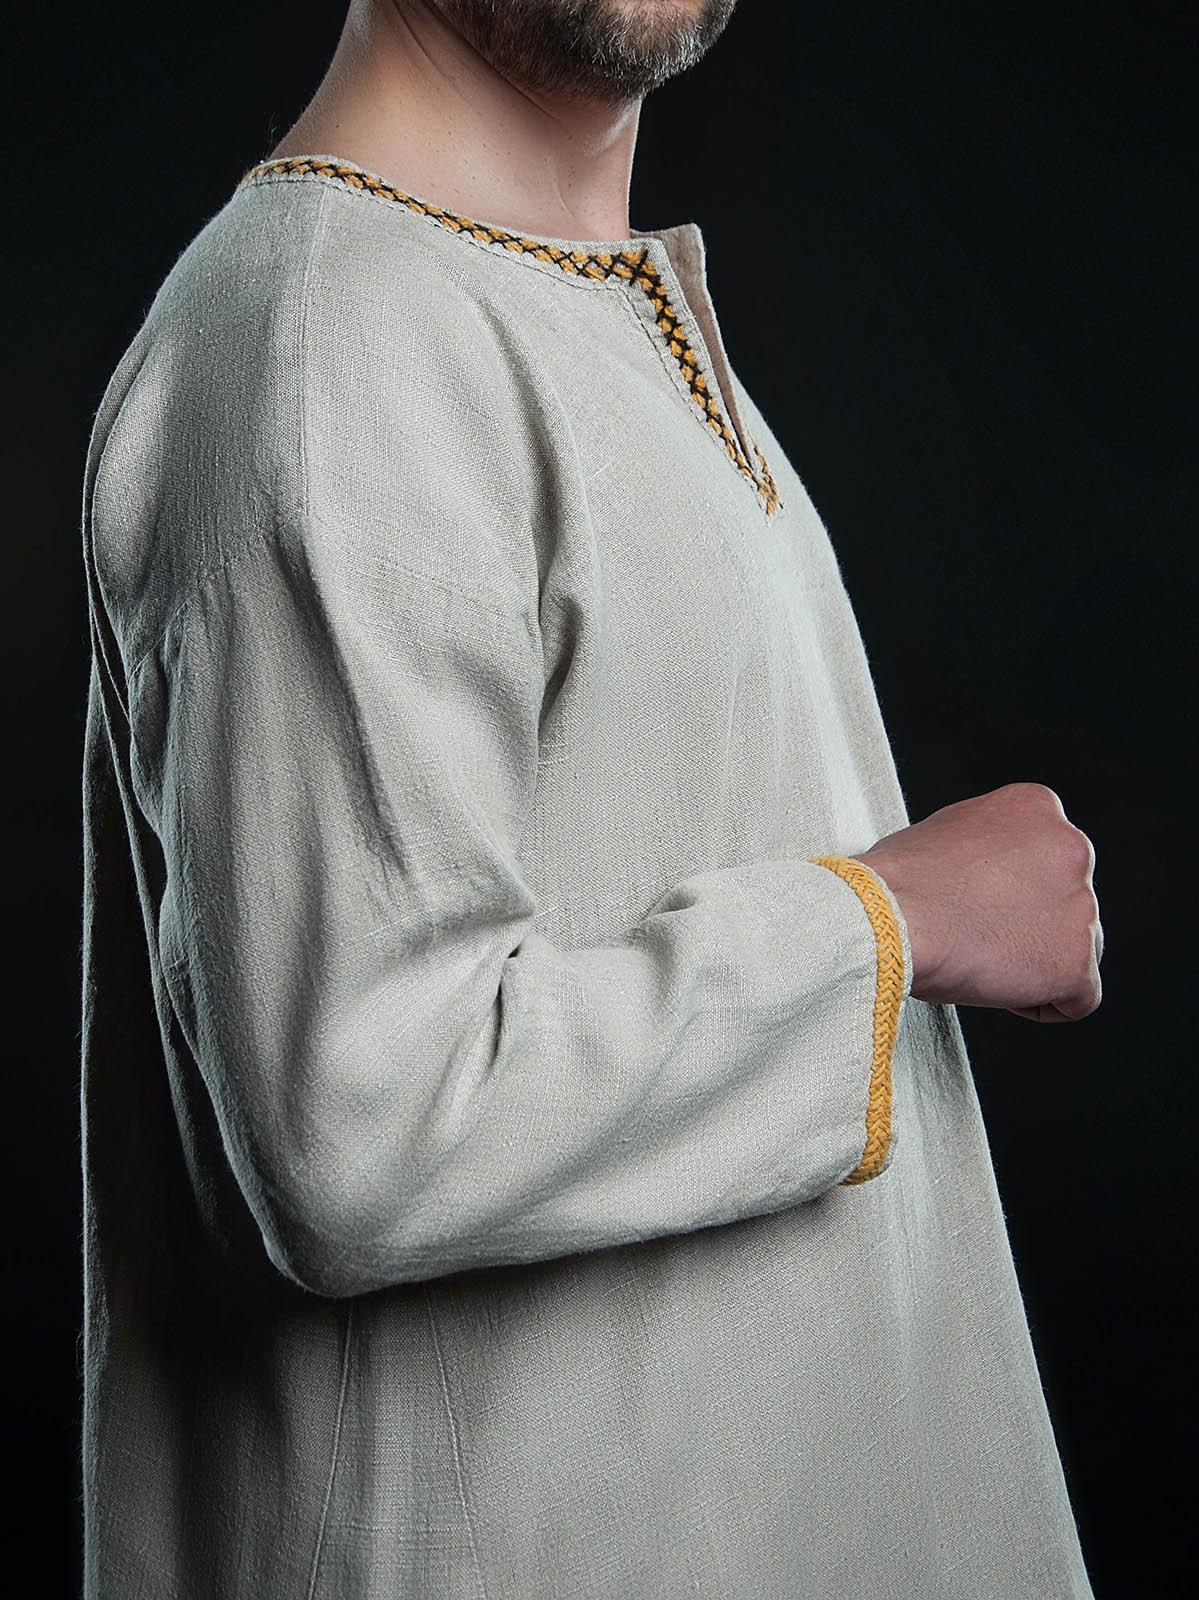 official photos a61d8 87574 Medieval viking shirt